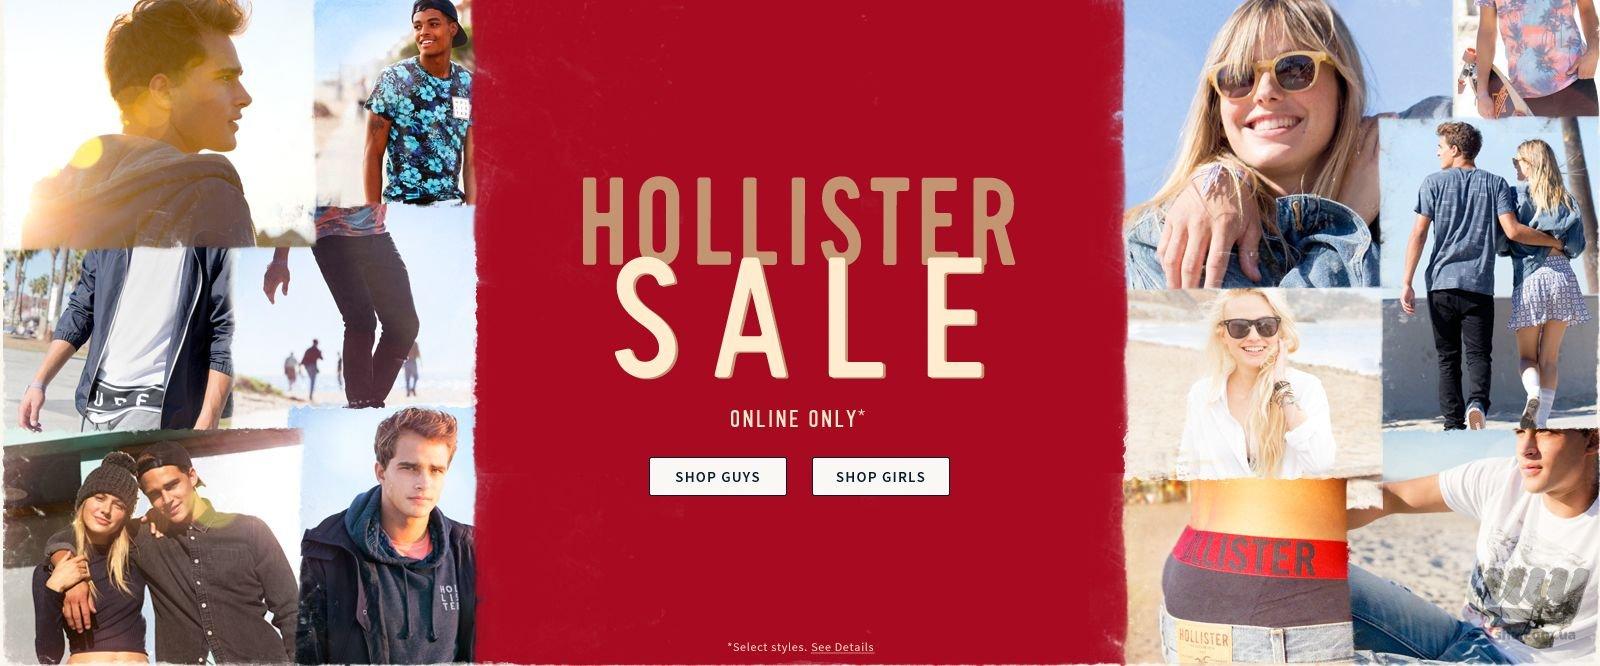 hol-MX-20150319-hphero-HollisterSale-NavB.jpg